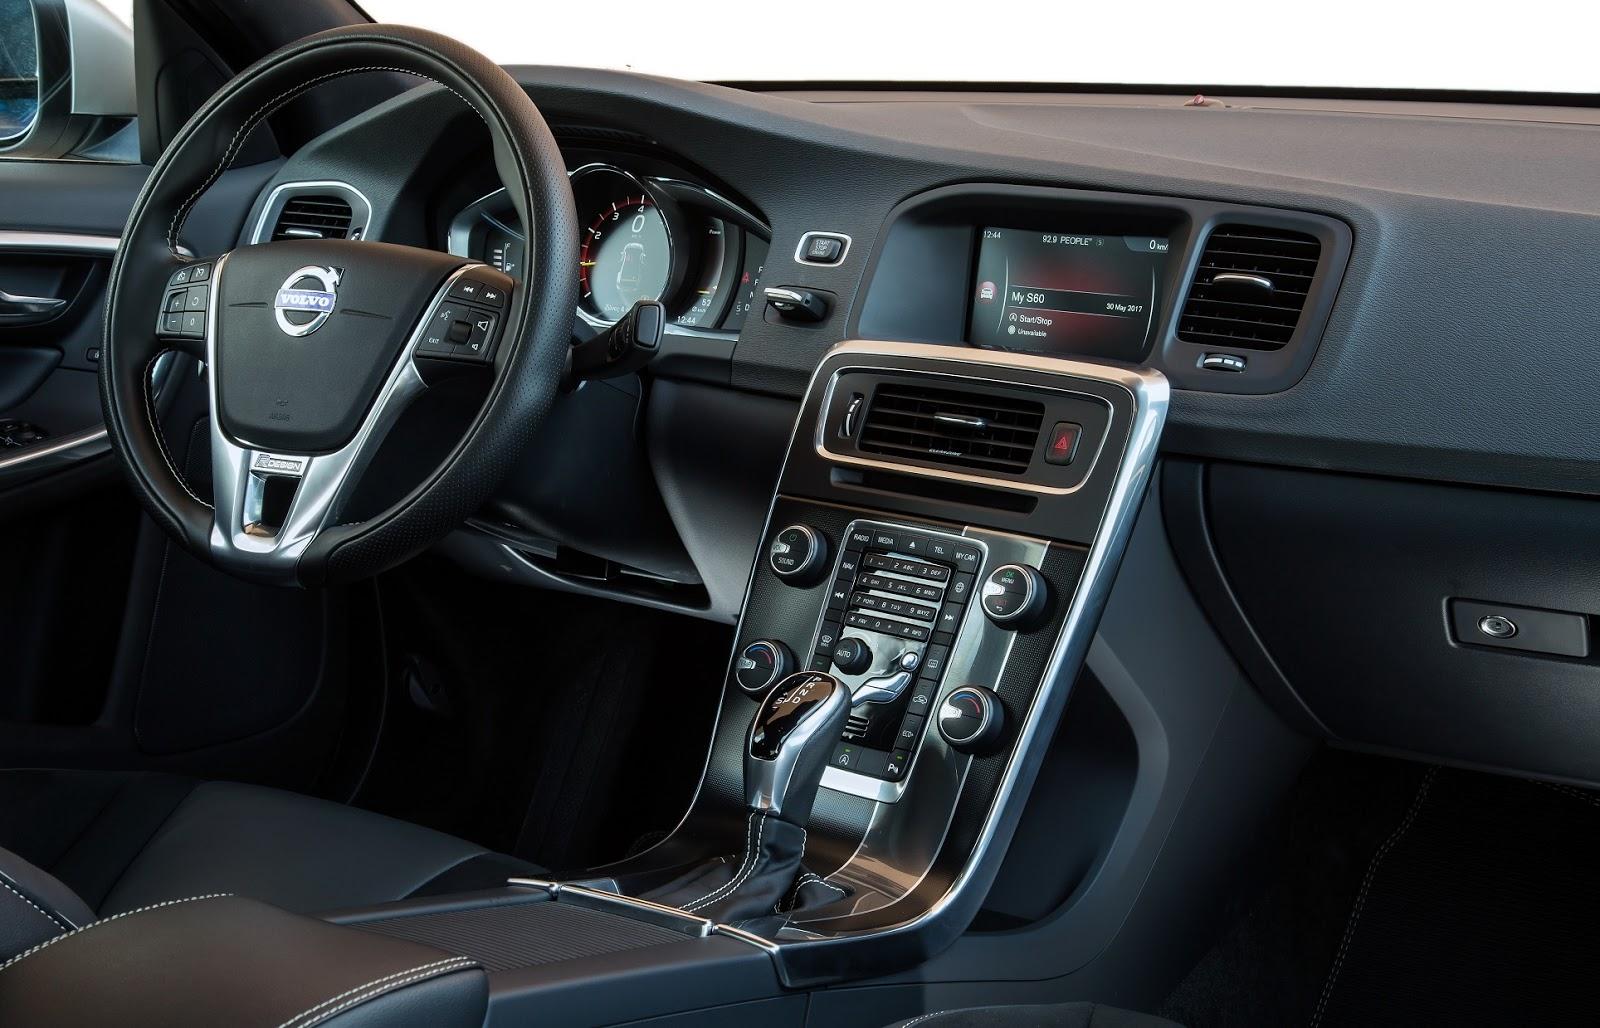 VOLVO2BS602BT32B1.52BAUTO 6 10 σημεία που κάνουν τα Volvo S60 και V60 την πληρέστερη πρόταση premium sedan, sedan, Station Wagon, Volvo, Volvo Car Hellas, Volvo Cars, Volvo S60, Volvo V60